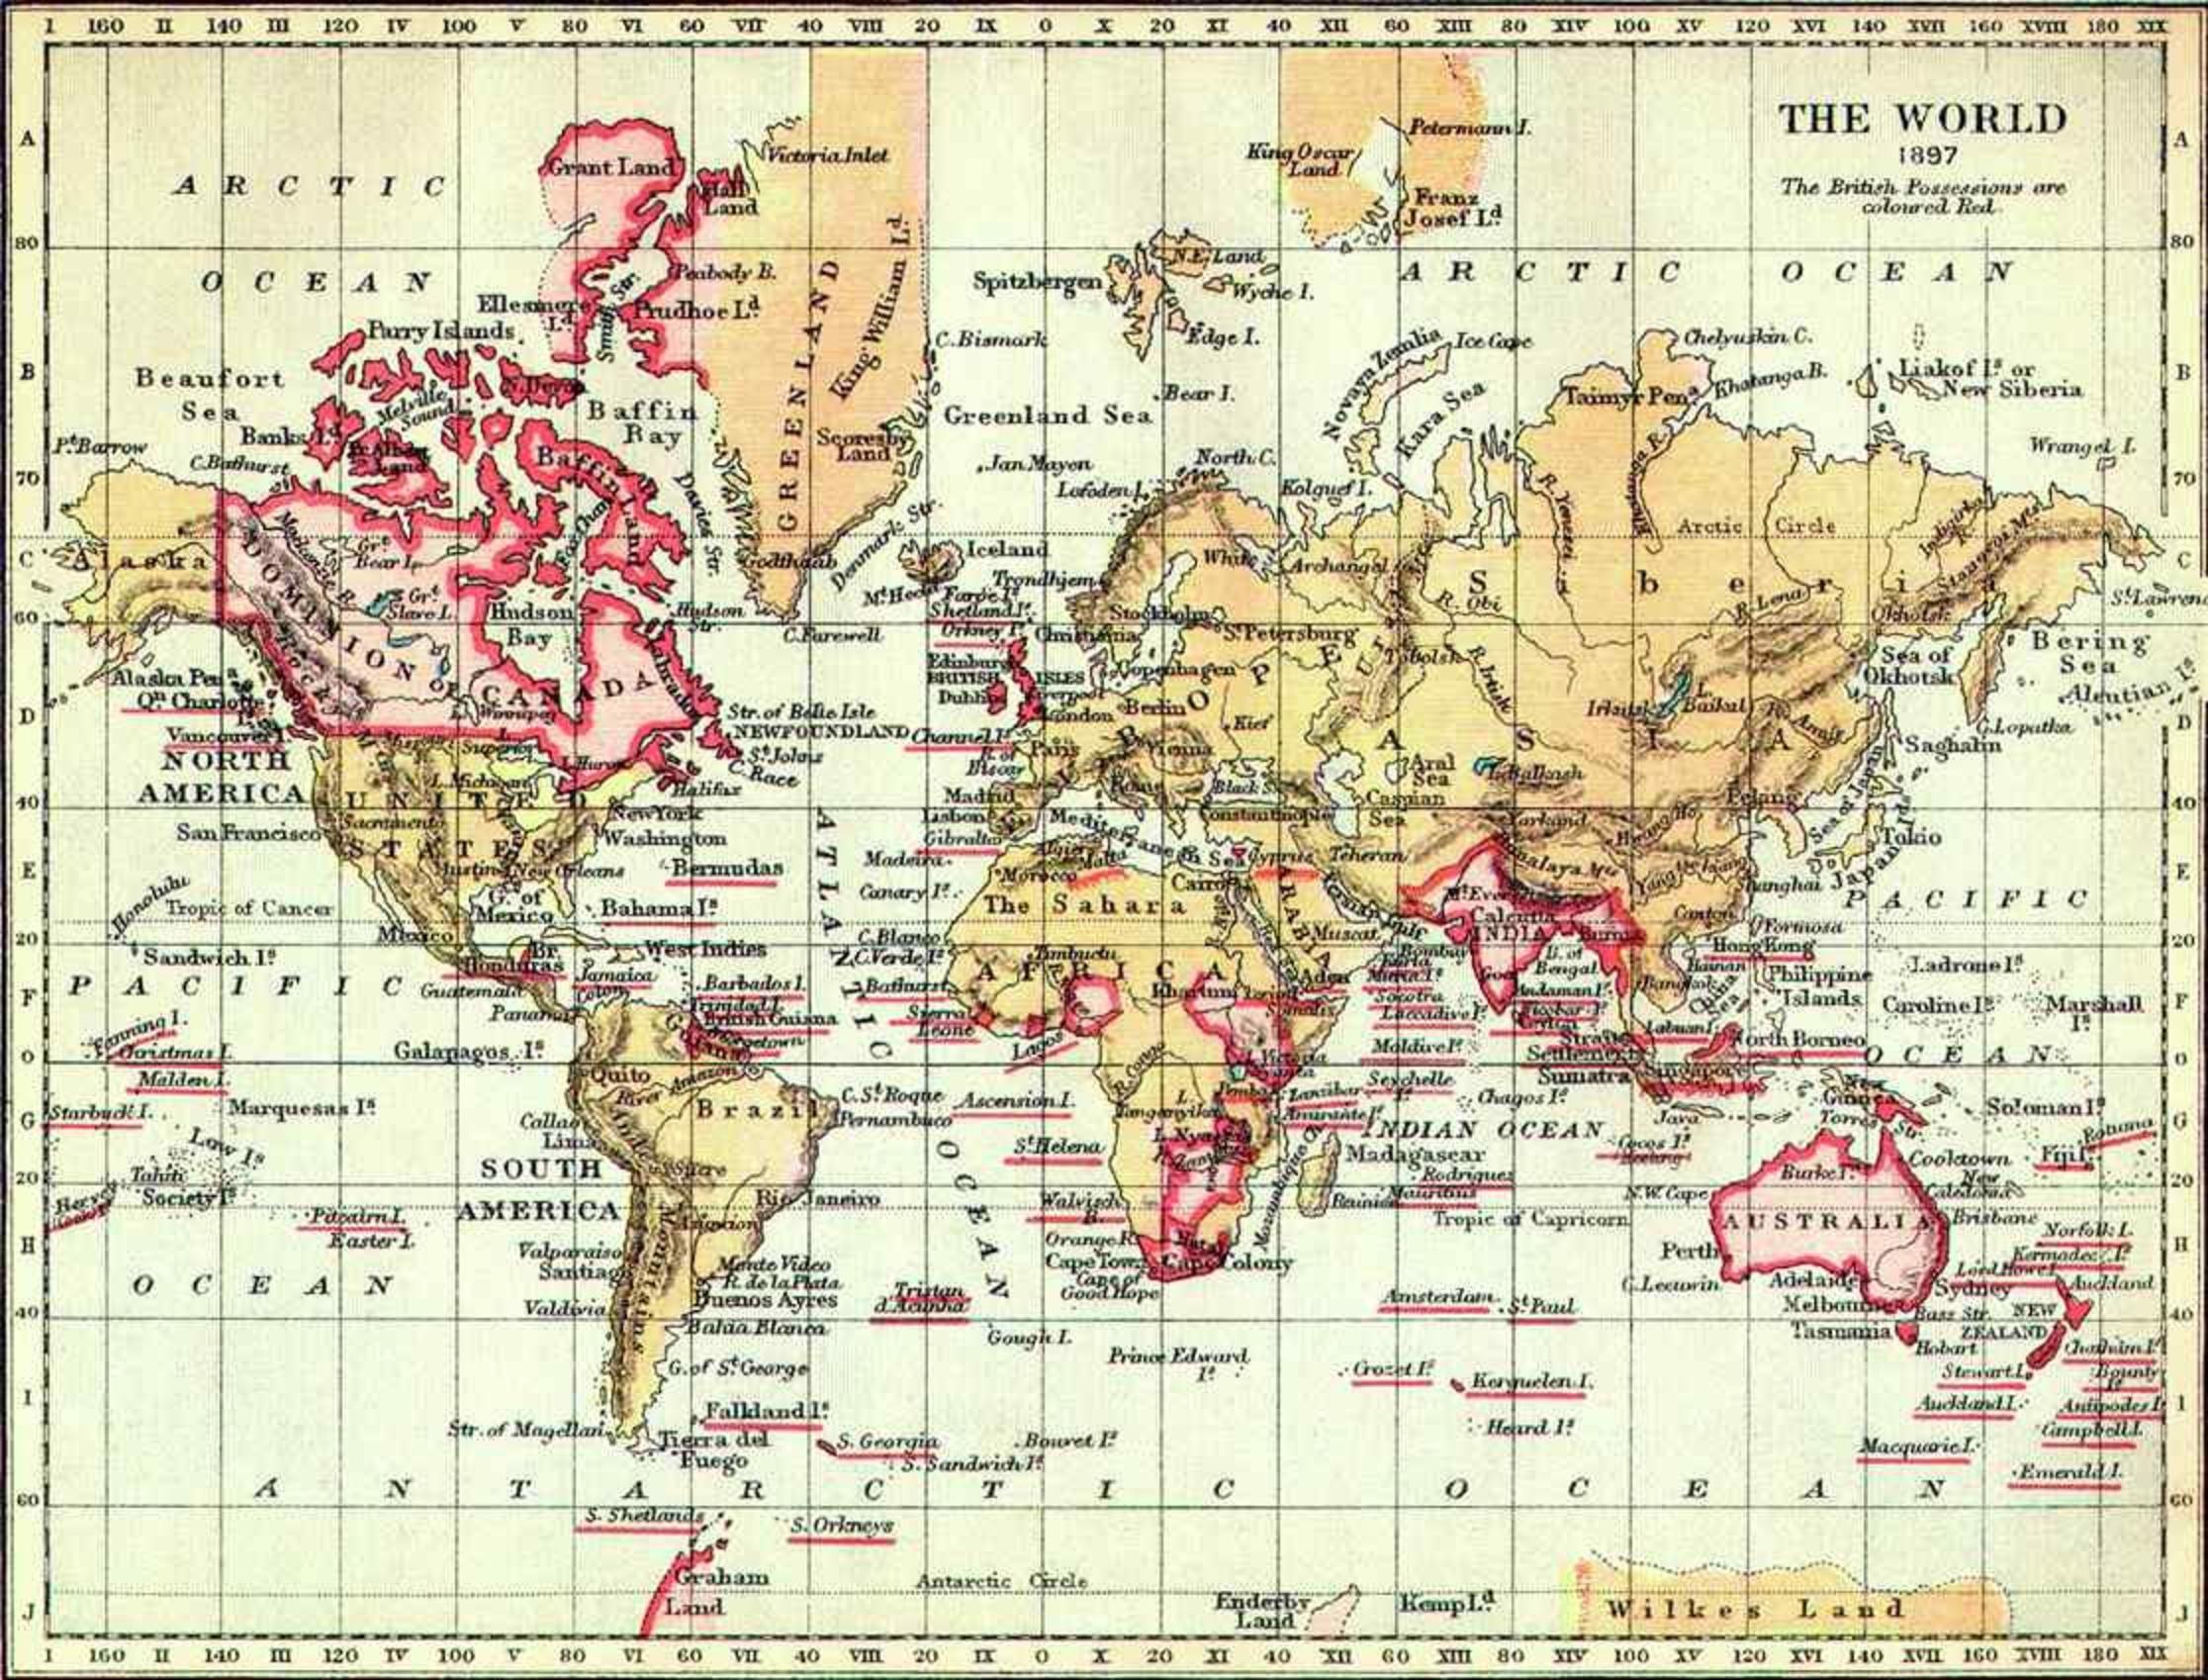 British empire c 1897 maps pinterest world map 1897 british empire gumiabroncs Gallery